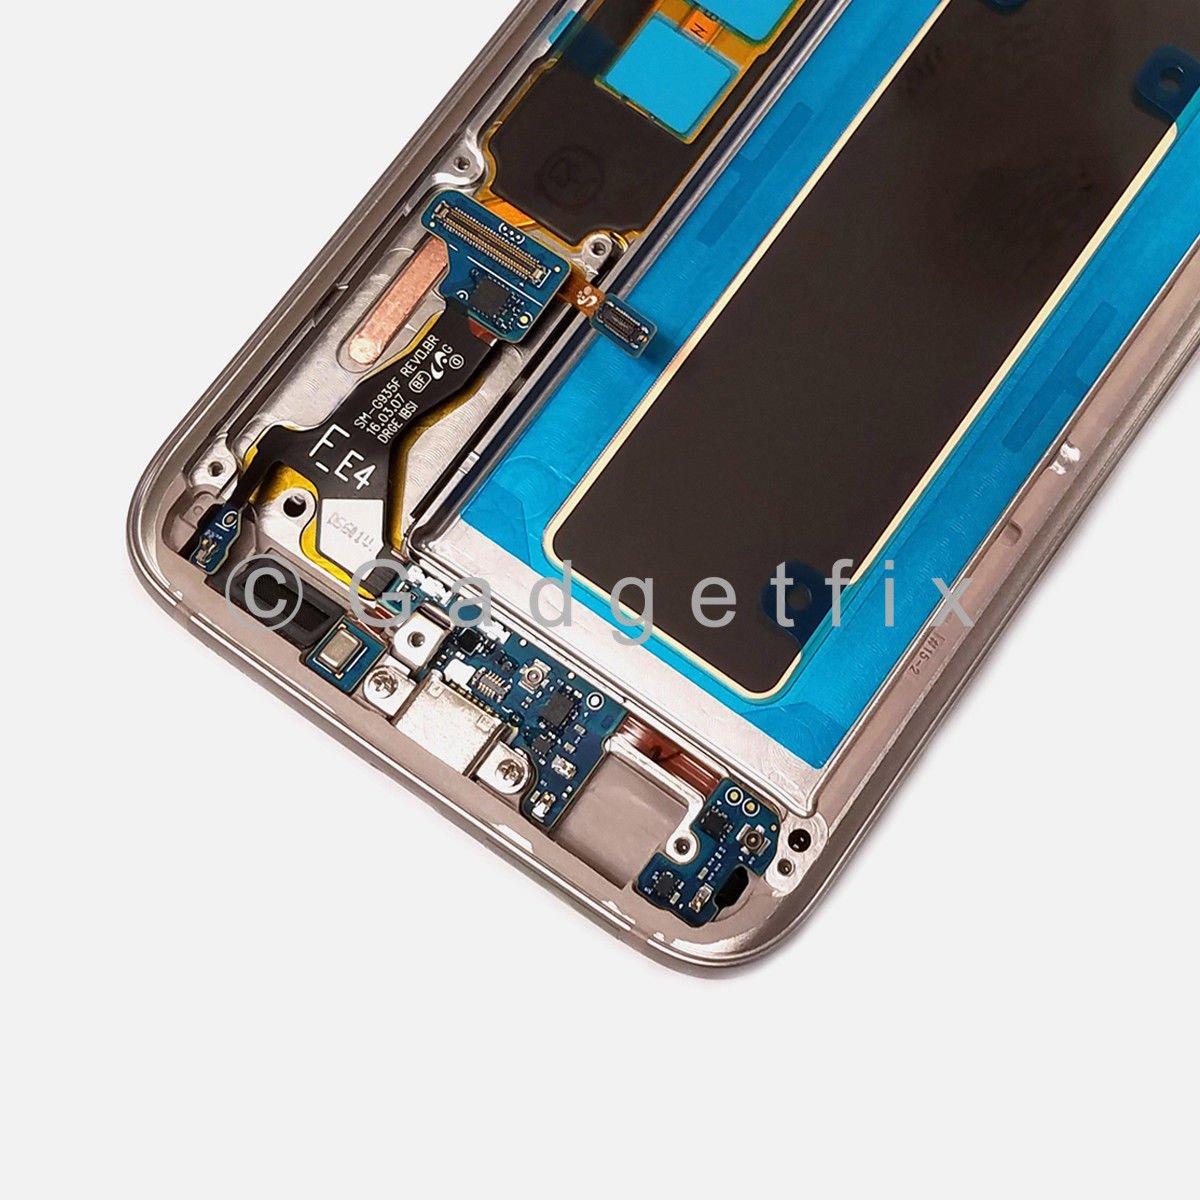 OEM Samsung Galaxy S7 Edge G935A G935T G935V G935P LCD Touch Screen Digitizer Frame